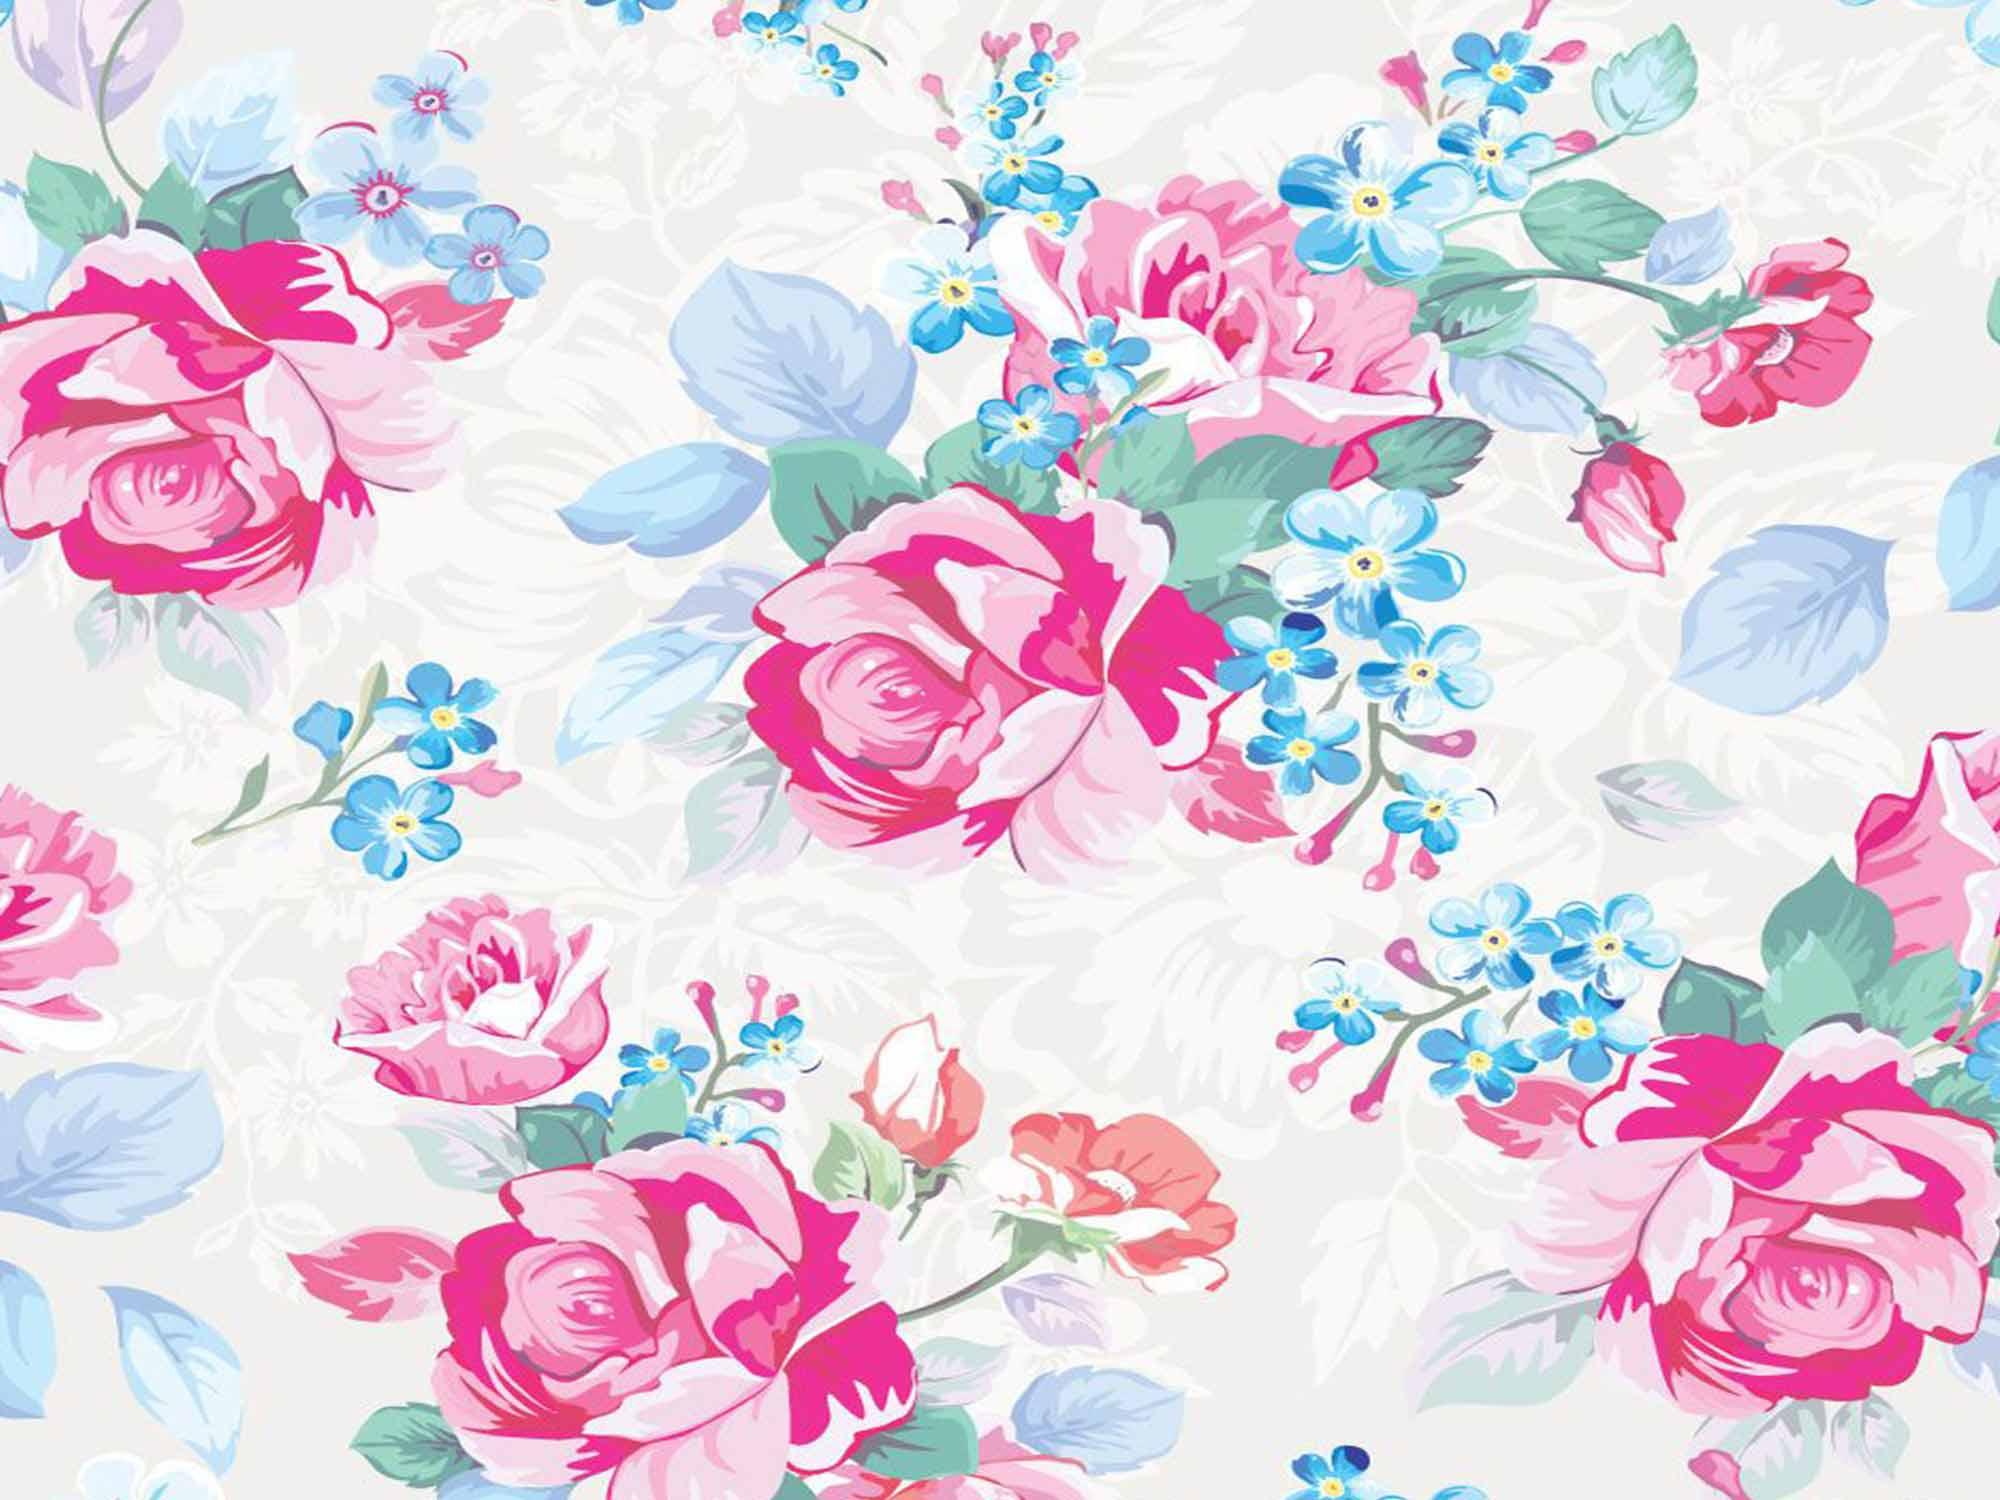 Papel de Parede Floral 0086 - Adesivos de Parede  - Paredes Decoradas